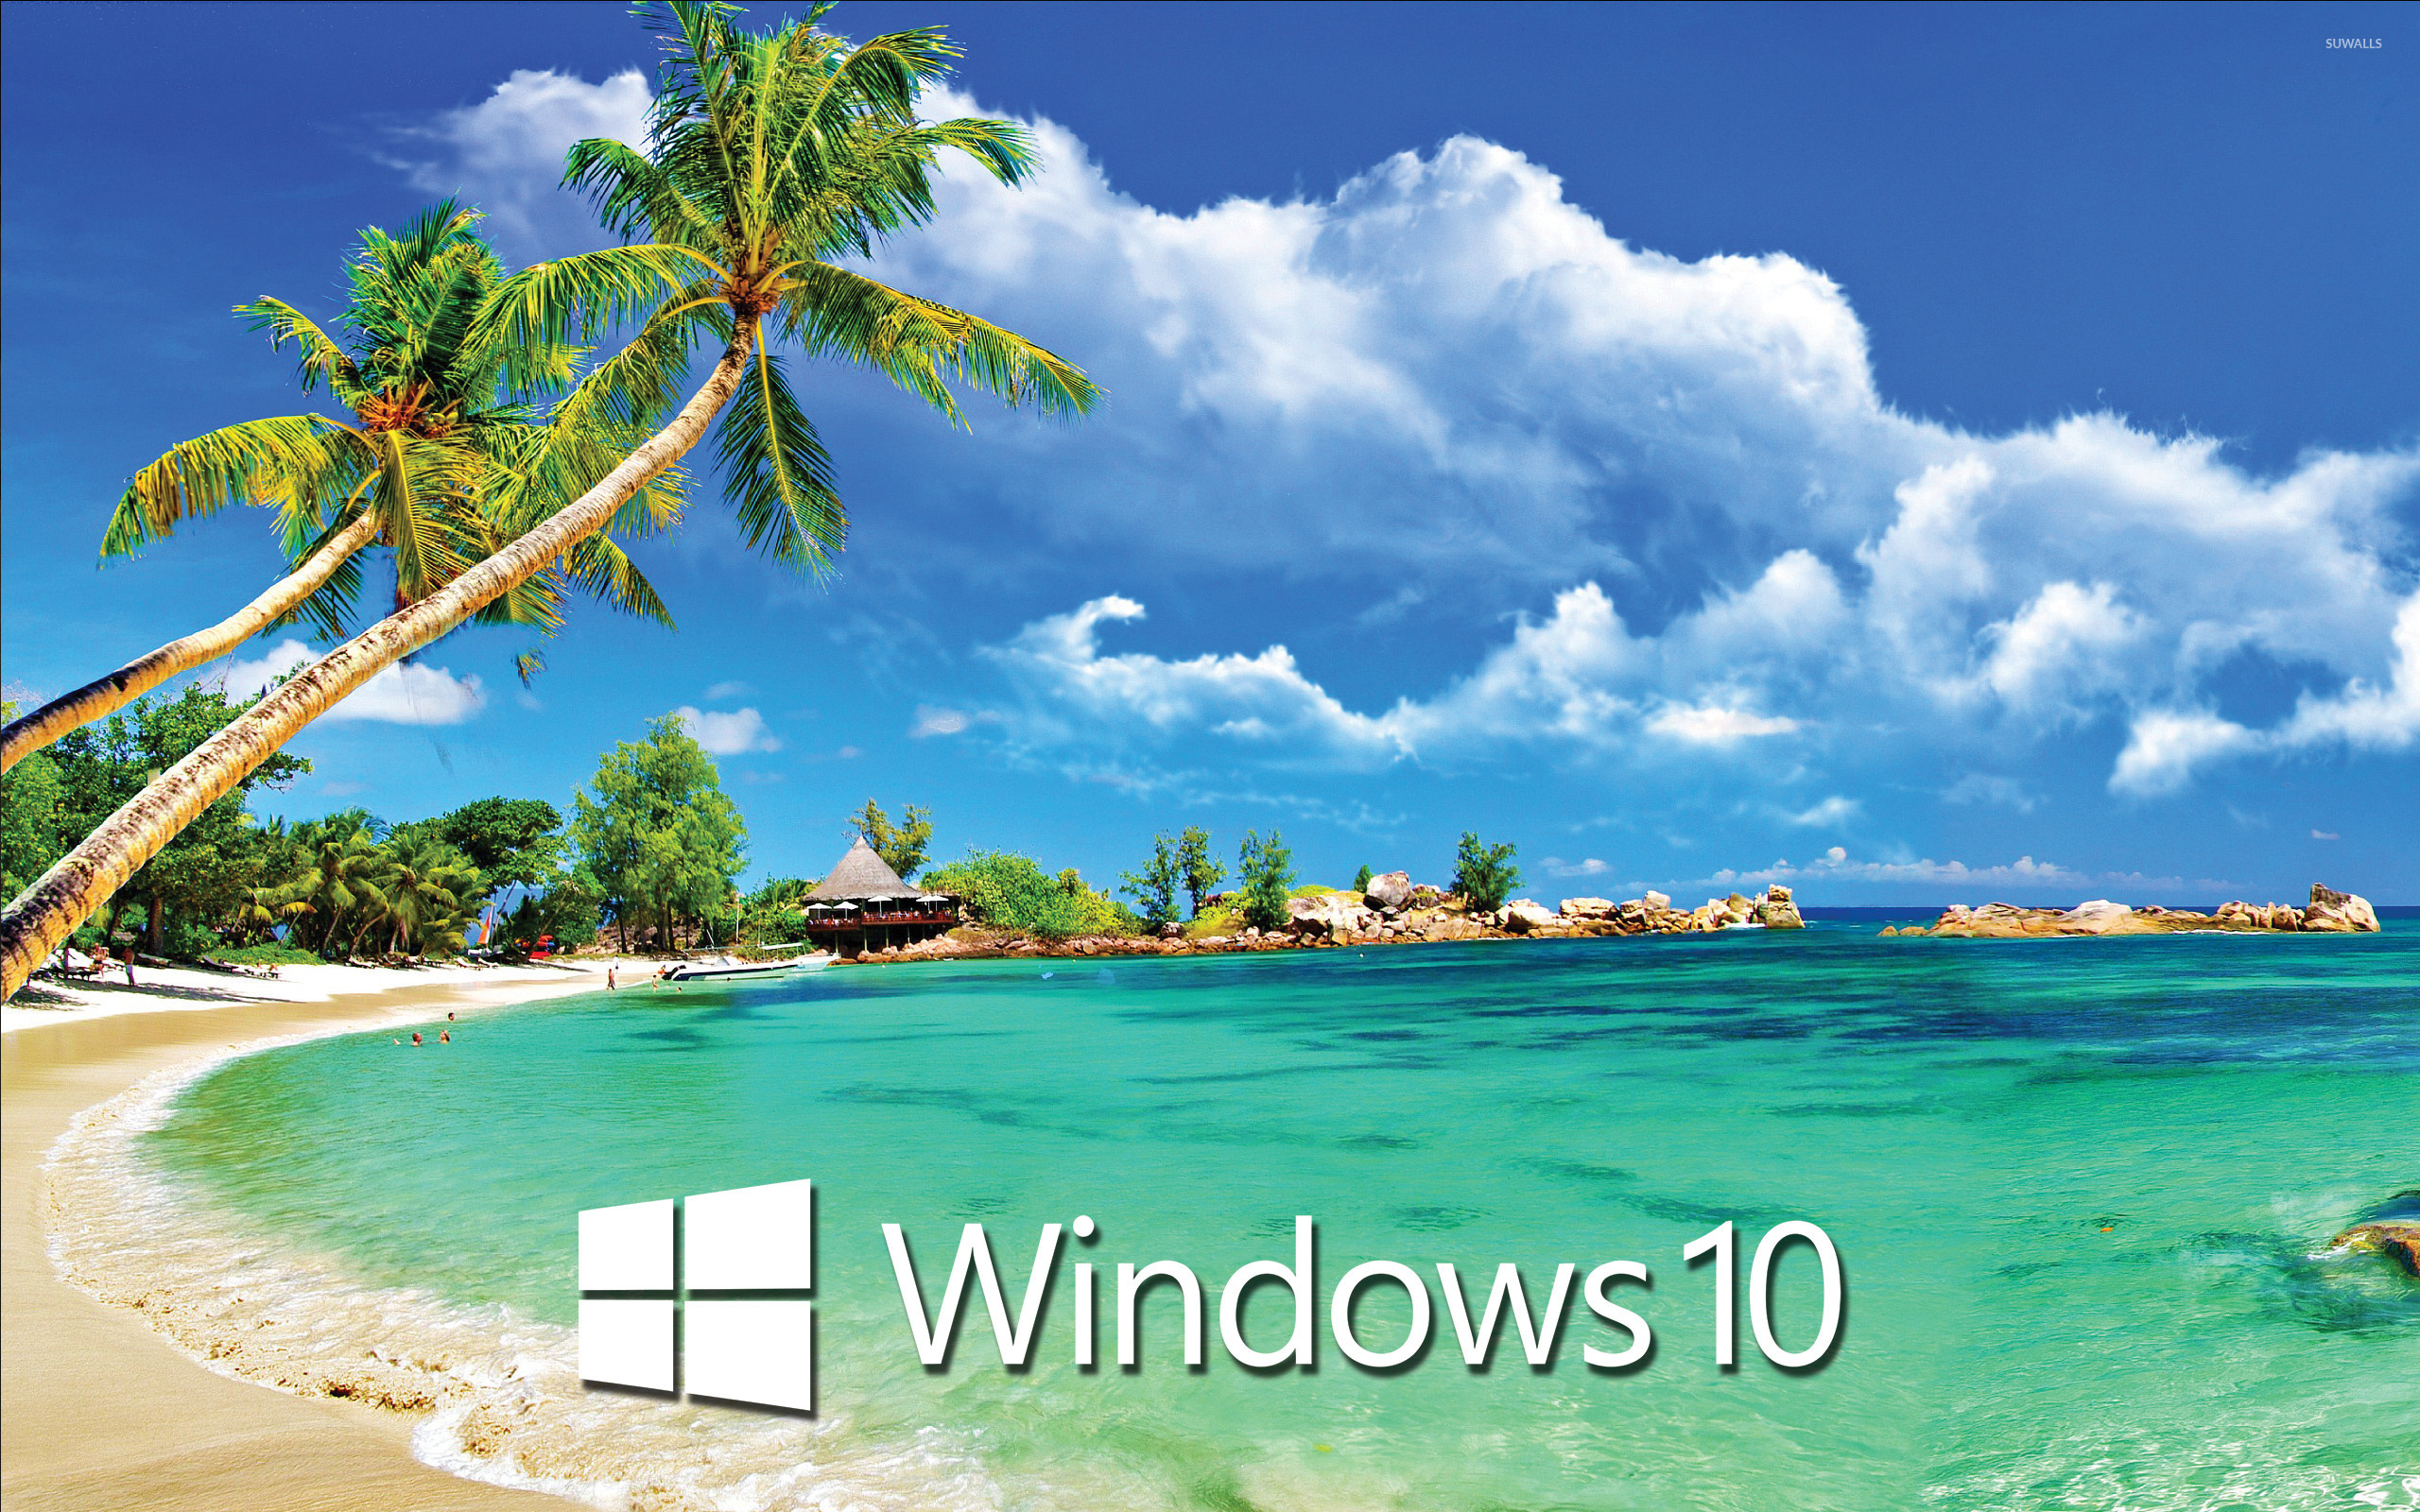 Windows 10 text logo on a tropical beach wallpaper 1680x1050 1680x1050